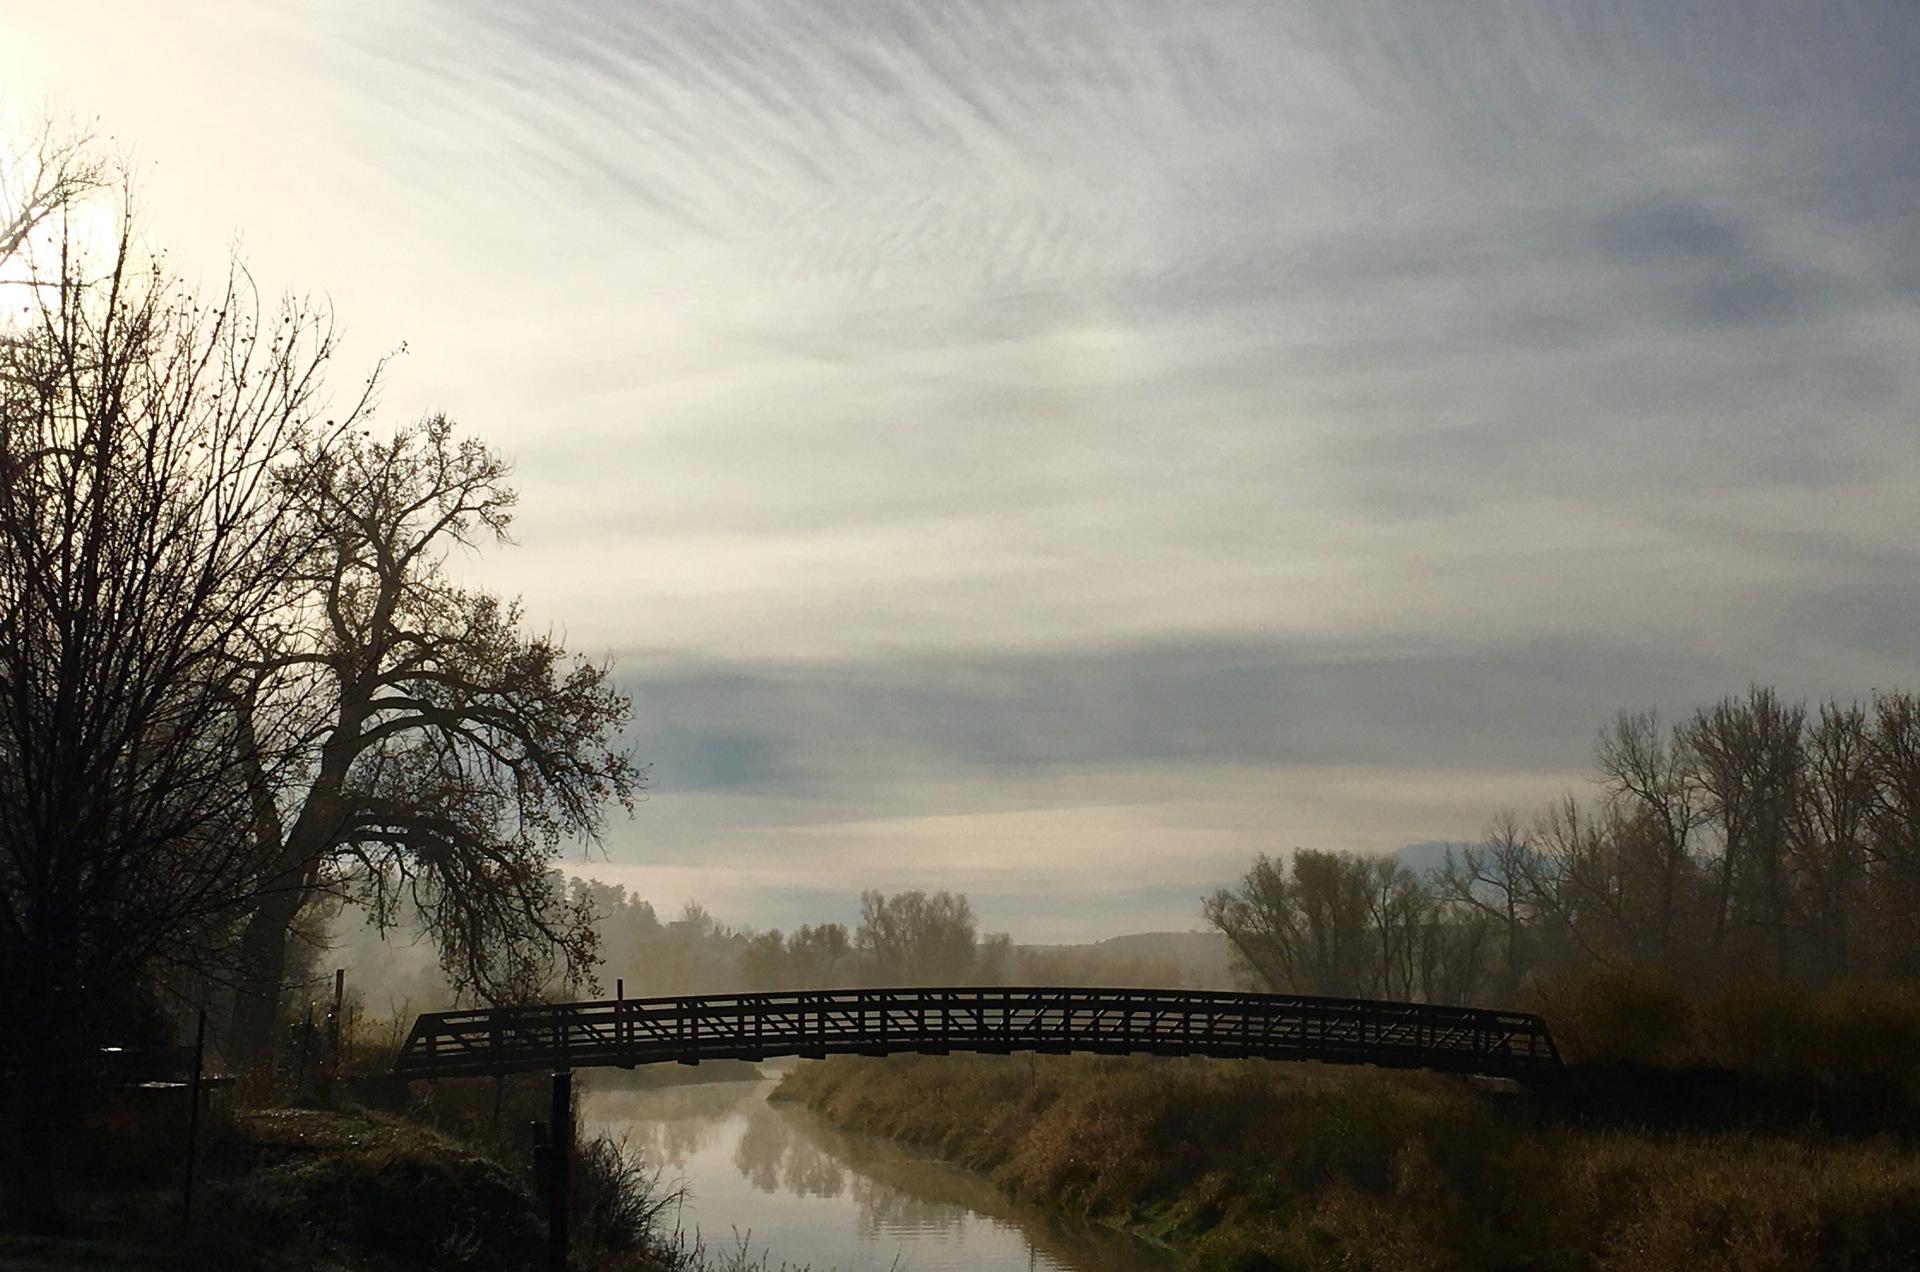 Bridge over river | bridge, connection, stream, nature